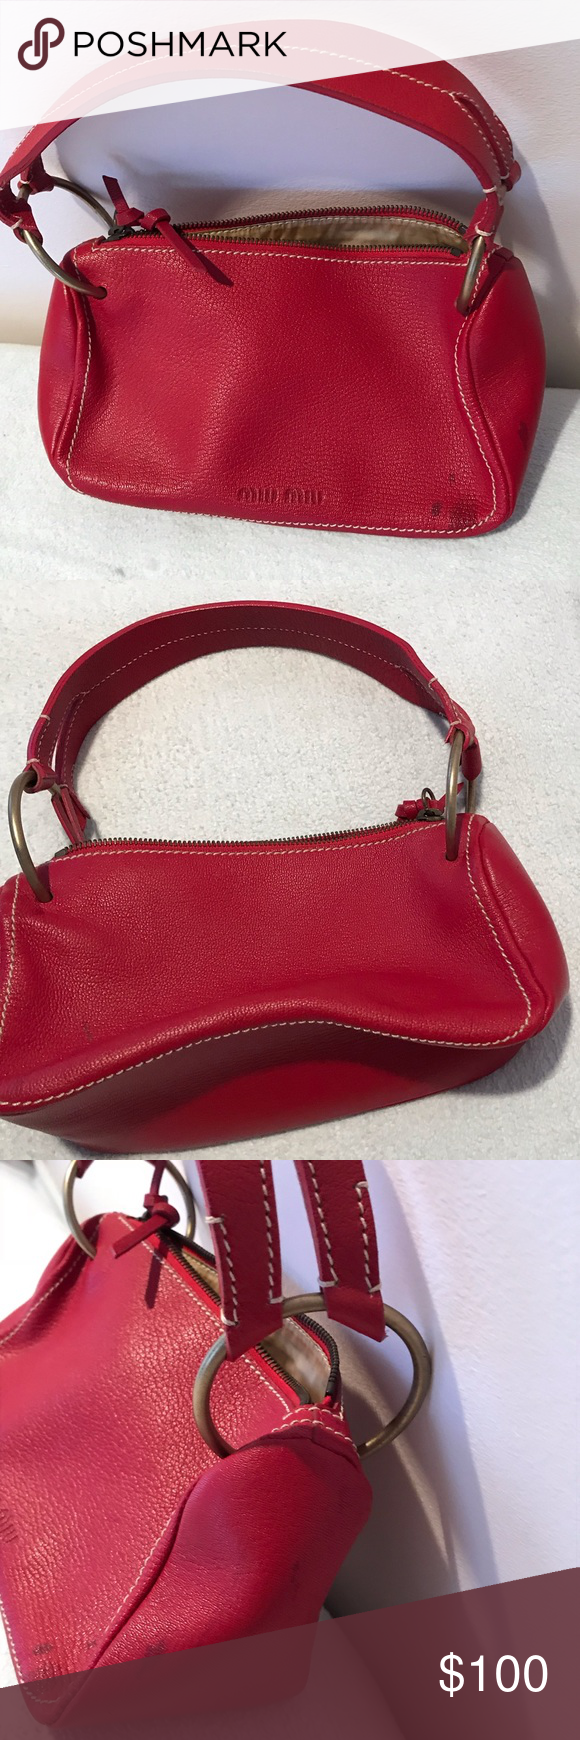 💯authentic vintage Miu Miu bag red Vintage Miu Miu bag with a few stains as 484c4f3d9e